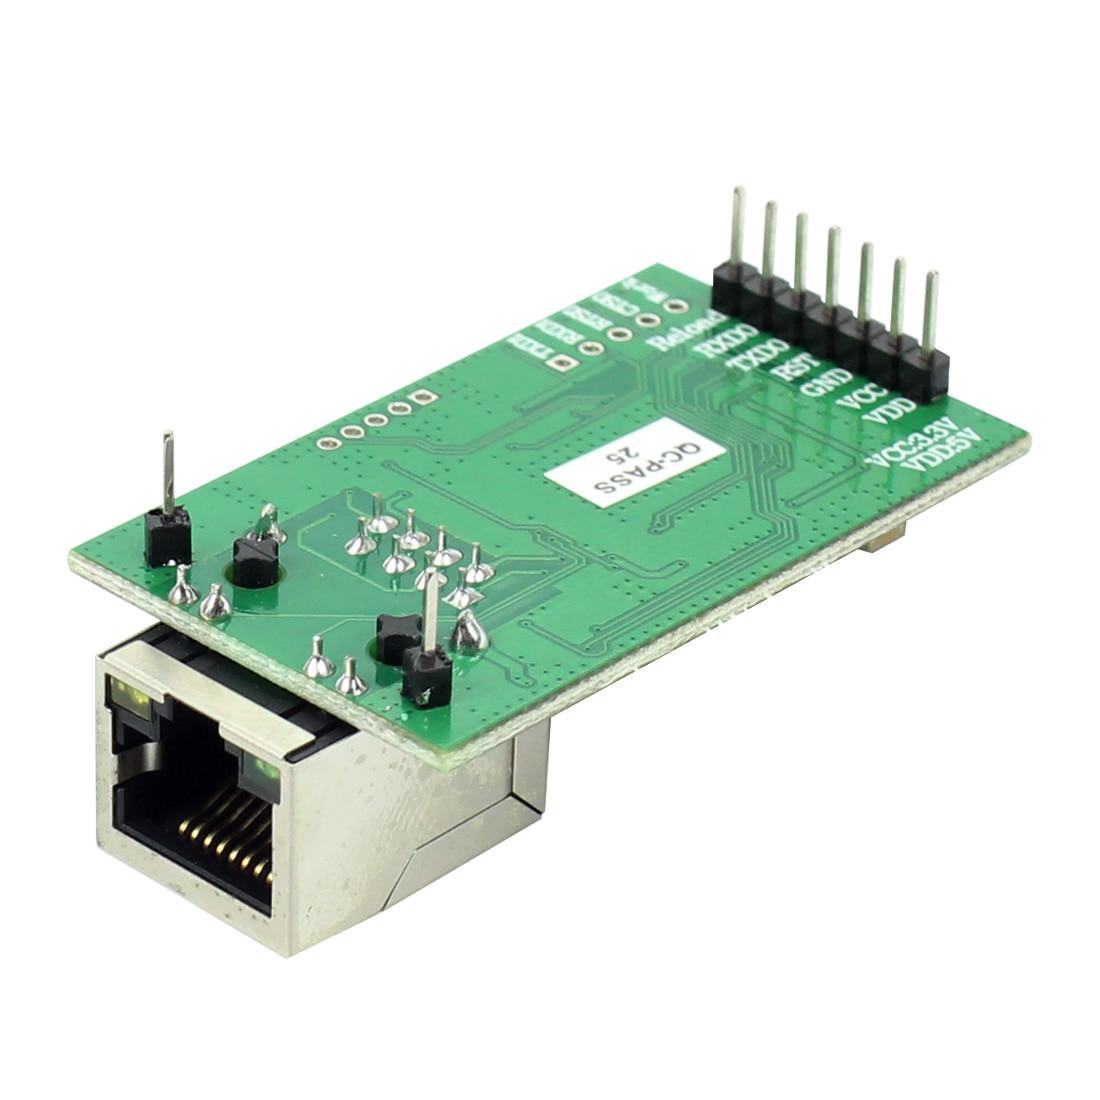 1 piece USR-TCP232-E2 Pin Type Serial UART TTL to LAN Ethernet Module 2 serial ports 5